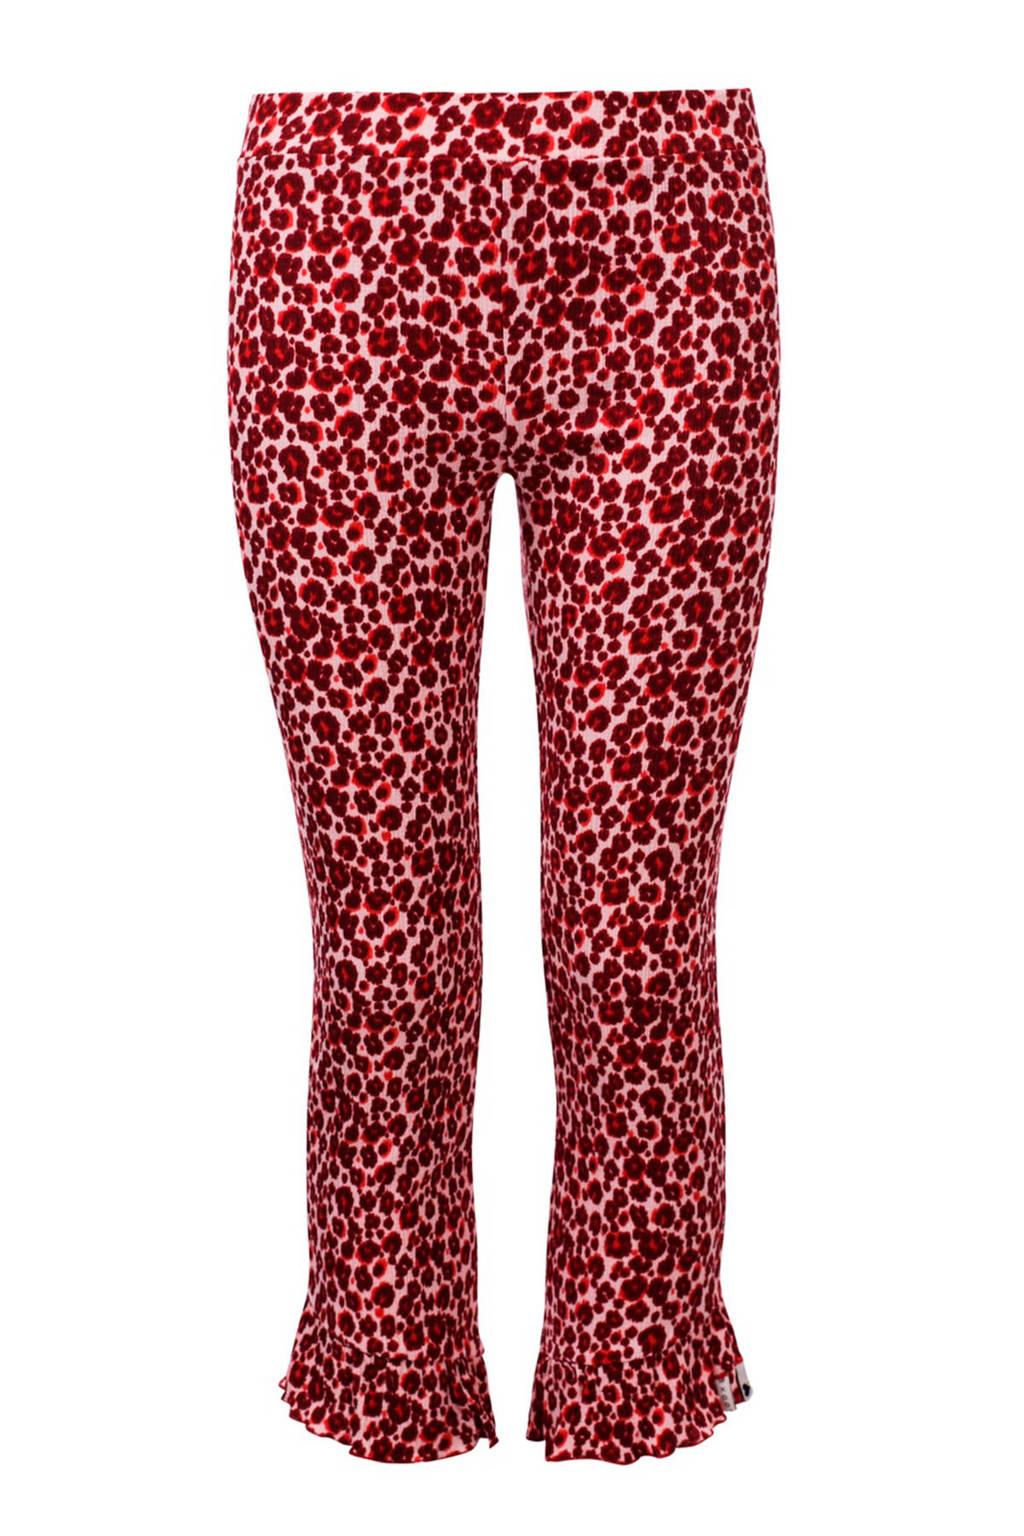 LOOXS flared broek met panterprint rood/roze, Rood/roze